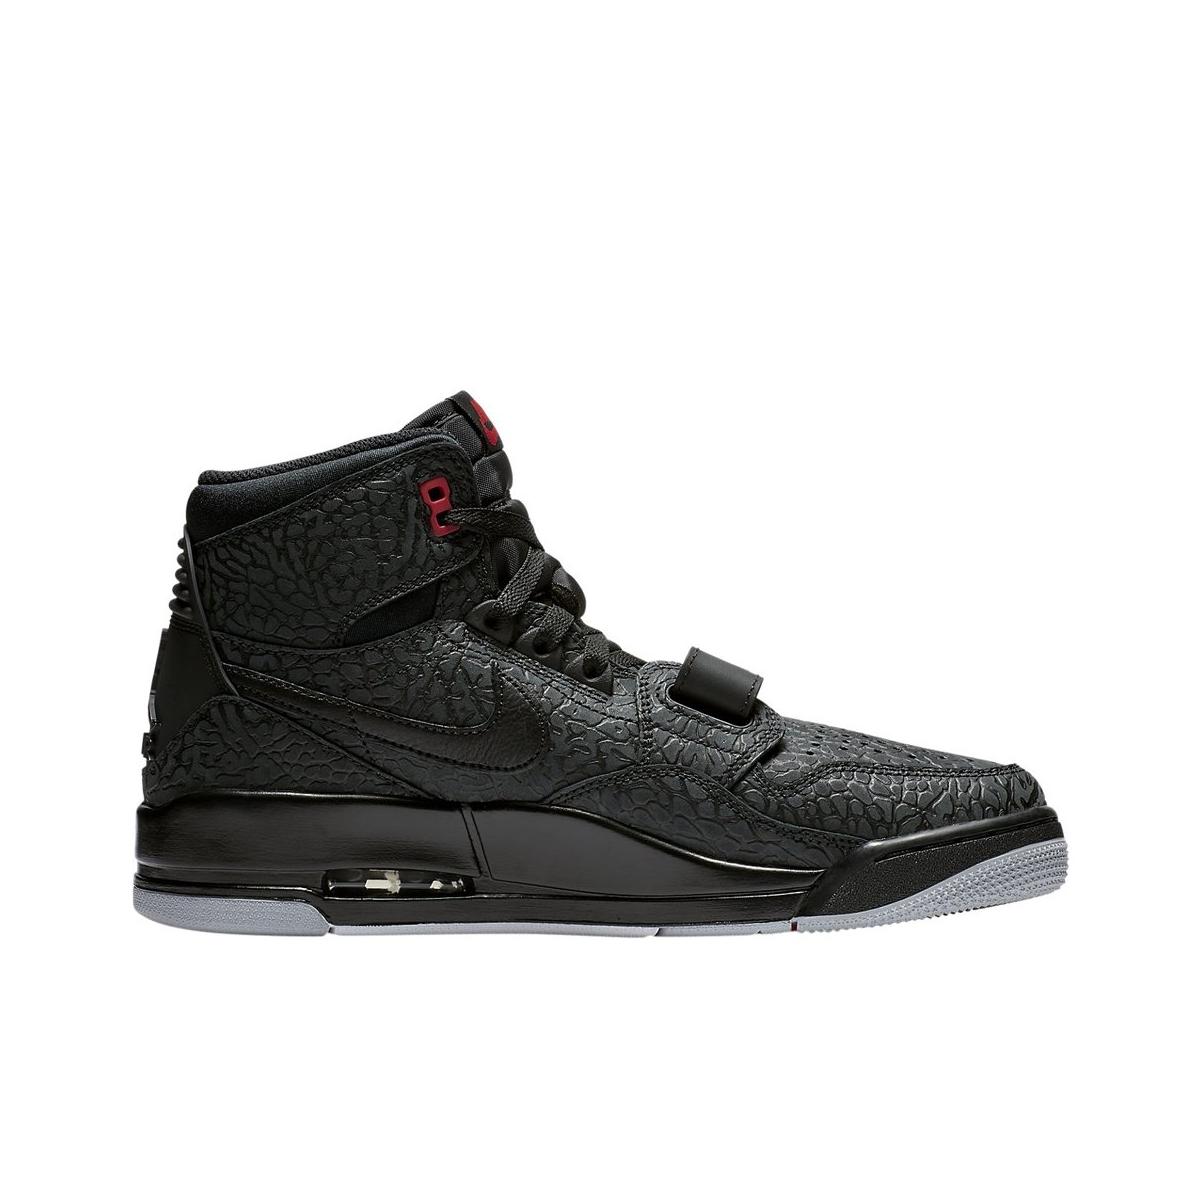 Tanie Buty Casual Nike Air Jordan Legacy 312 Nike